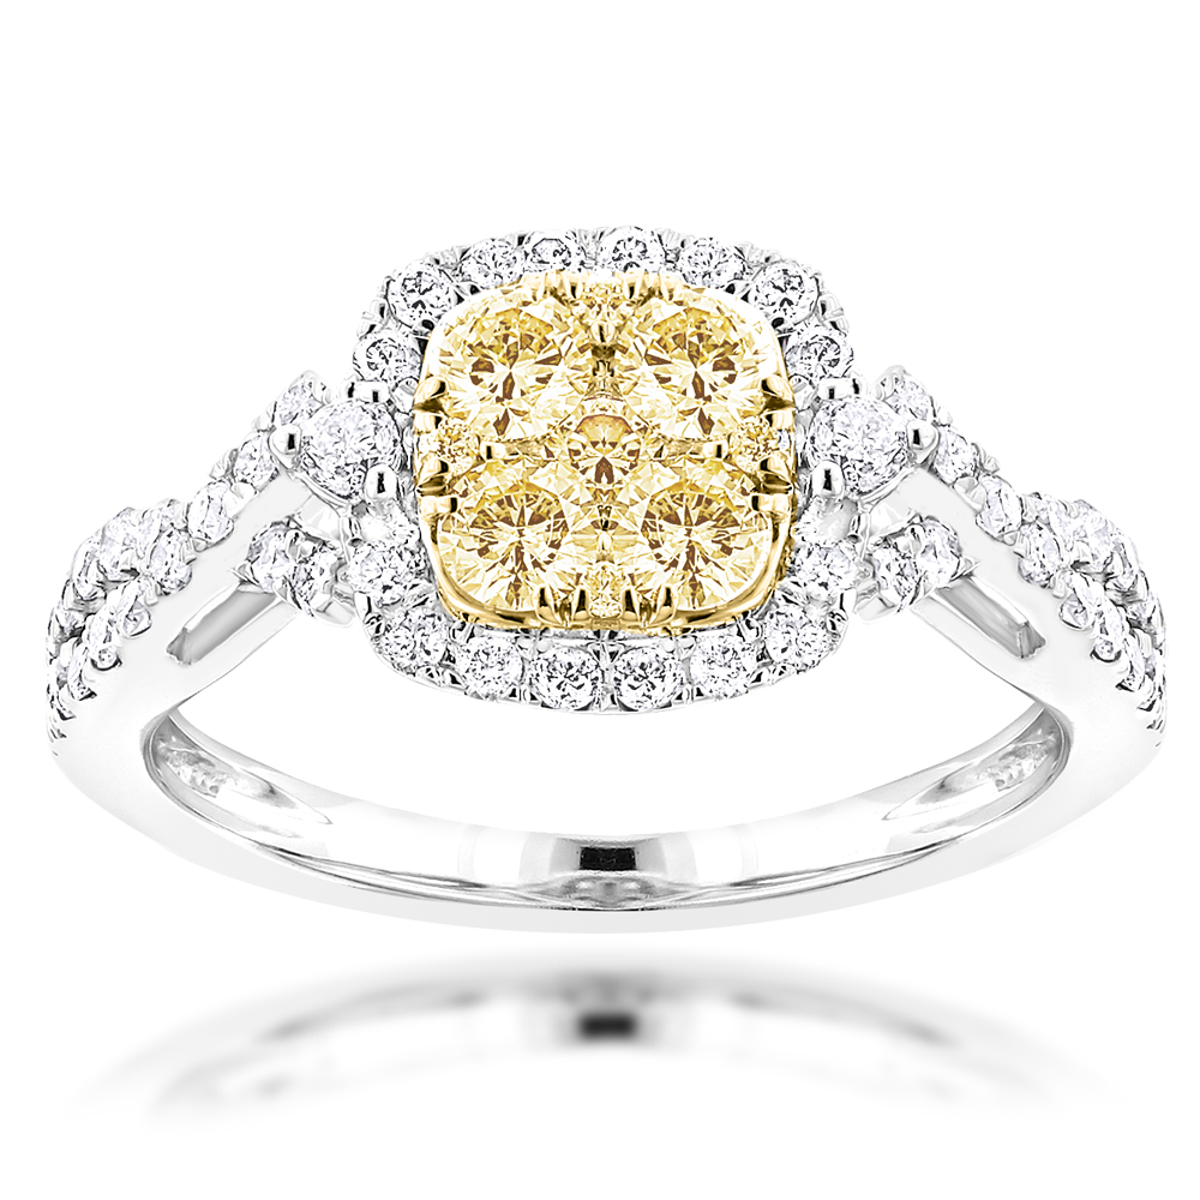 Ladies Natural Yellow Diamond Ring 1.39ct 14K Gold Halo Design